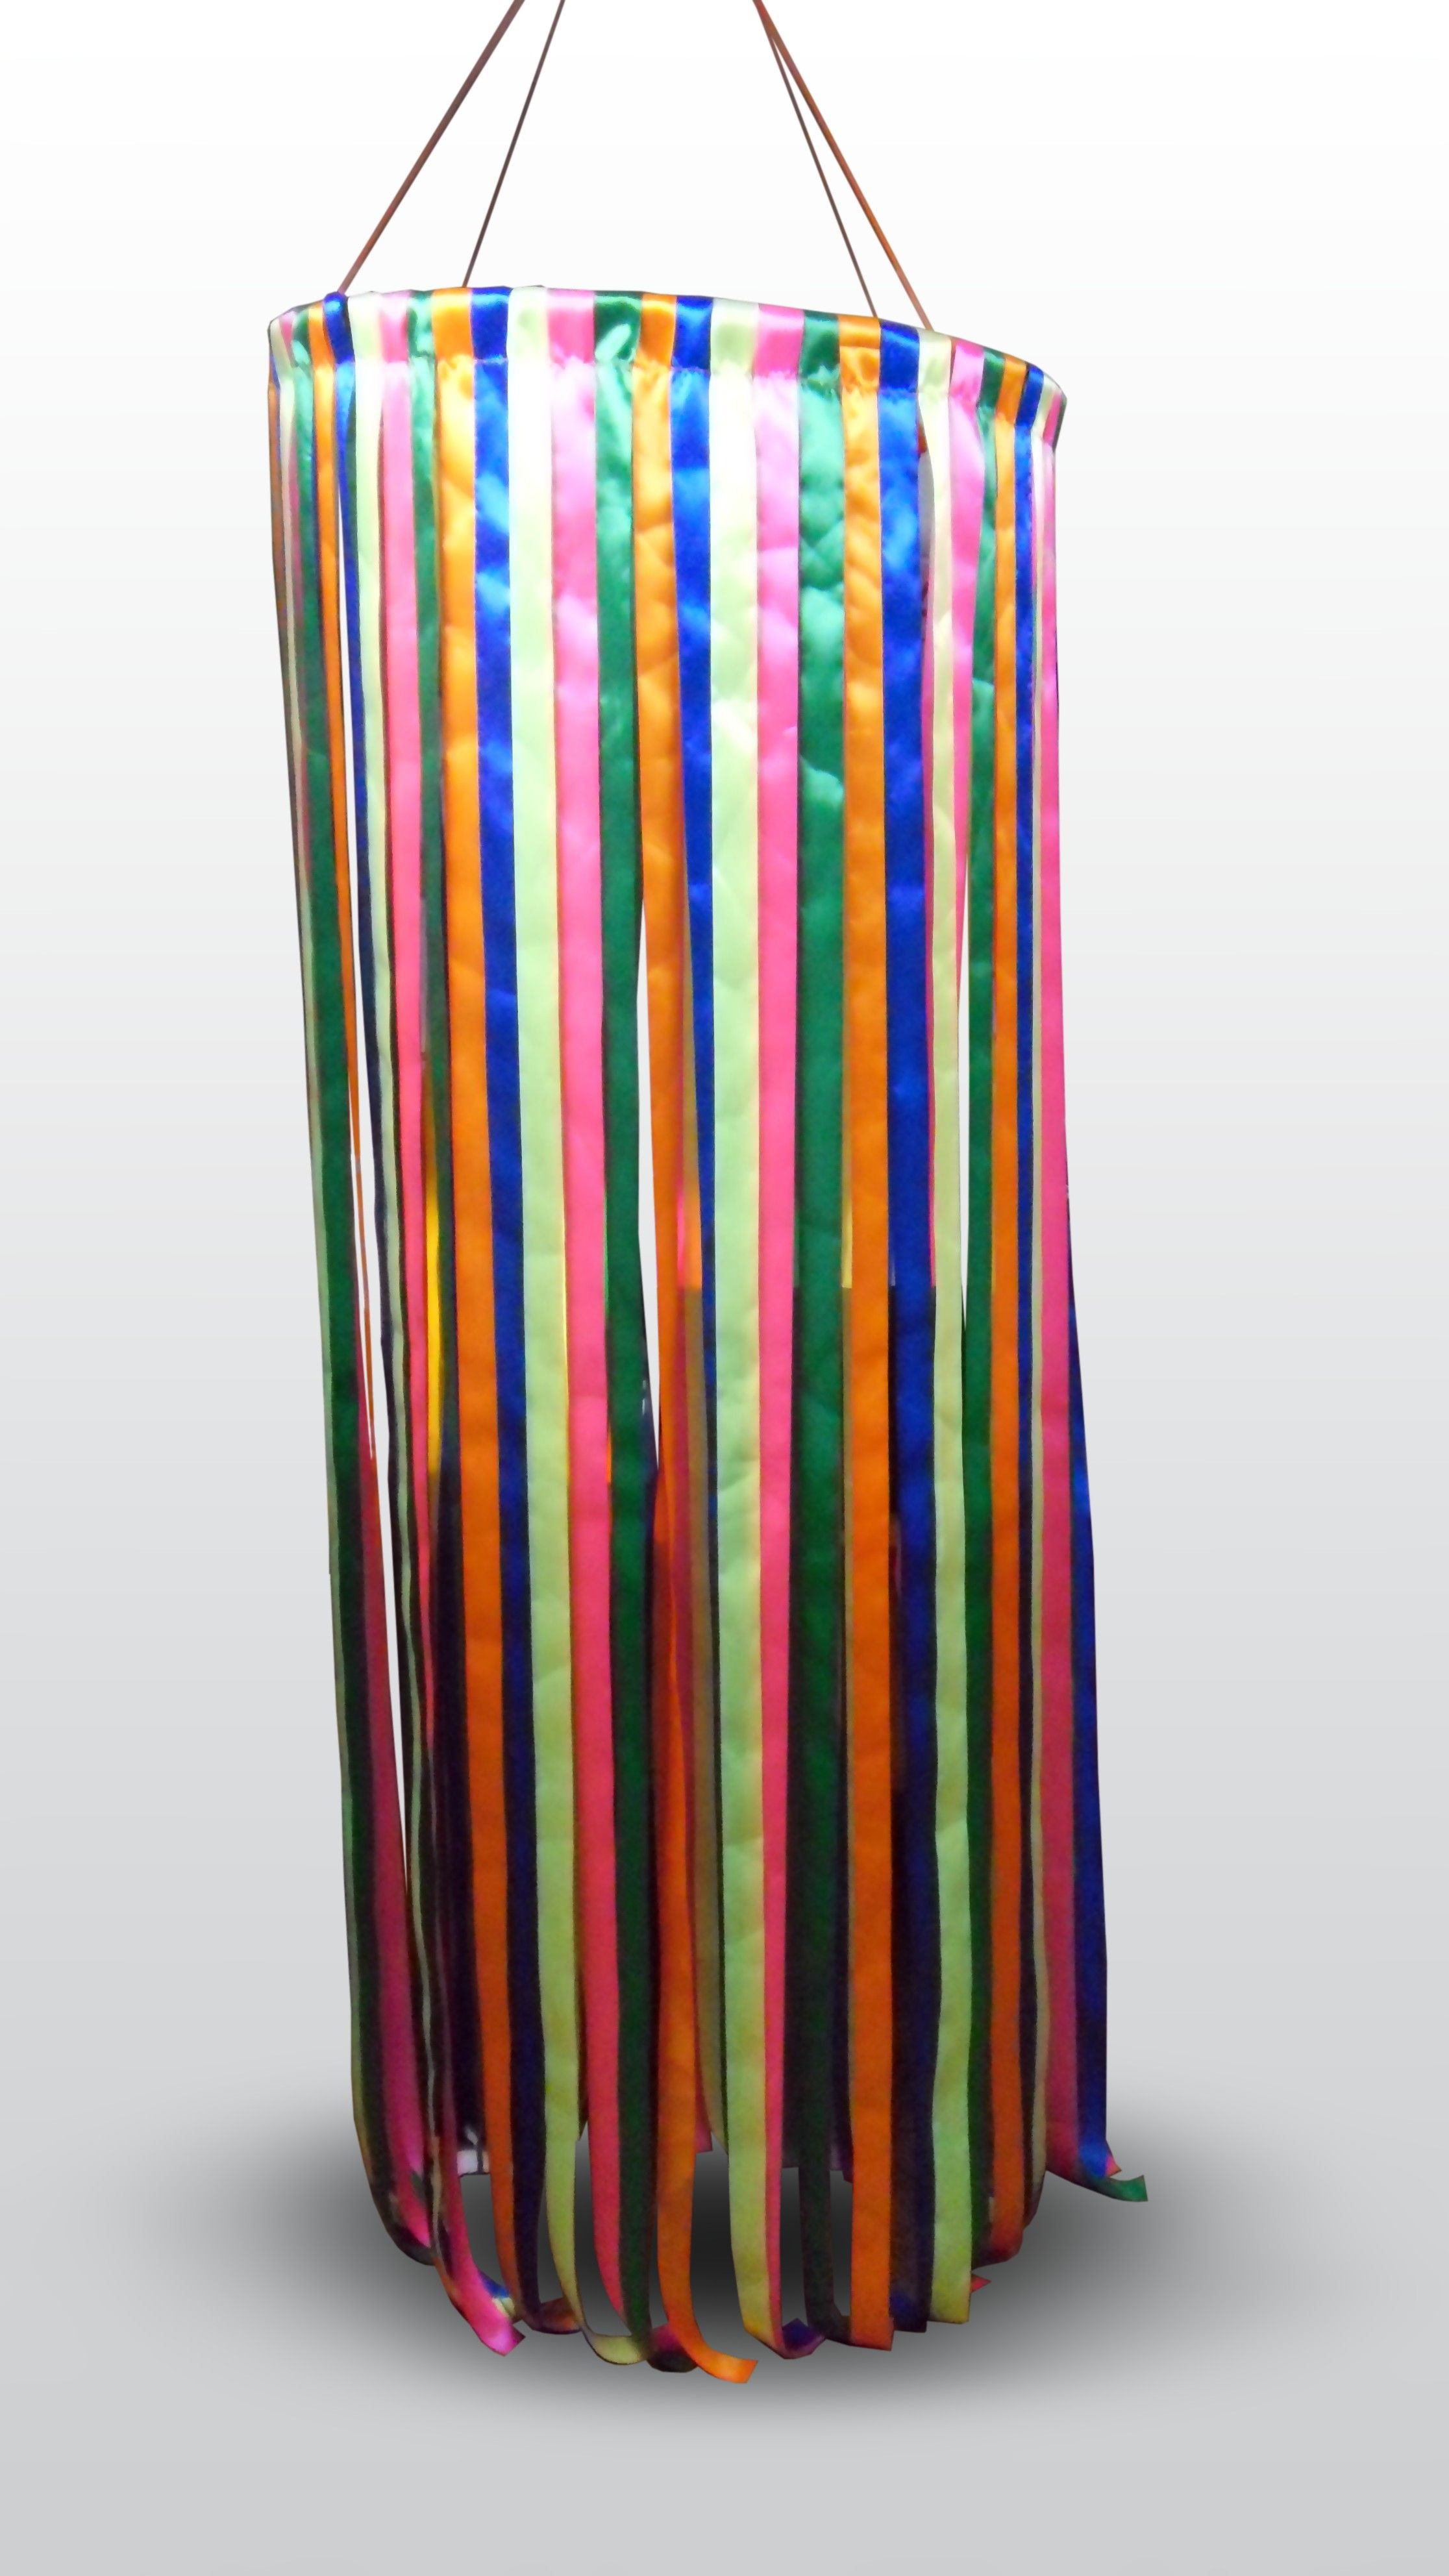 FSI Analytica / Dry shower d-0.75m, L-2m